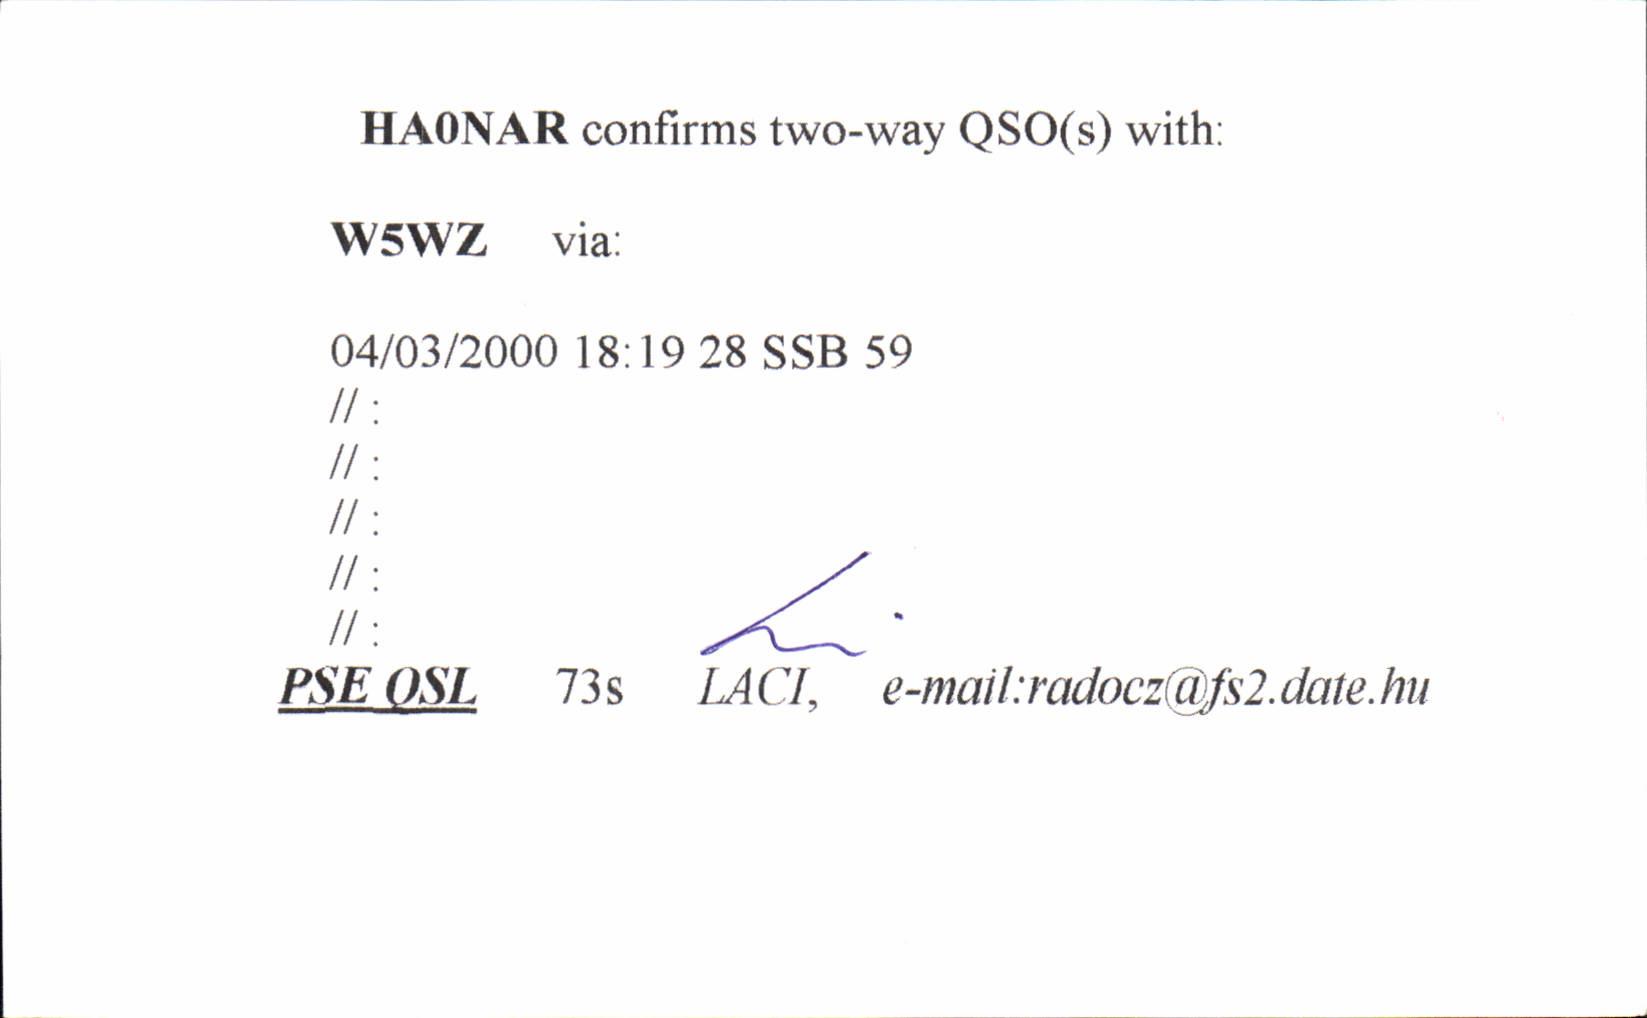 HA0NAR_REAR